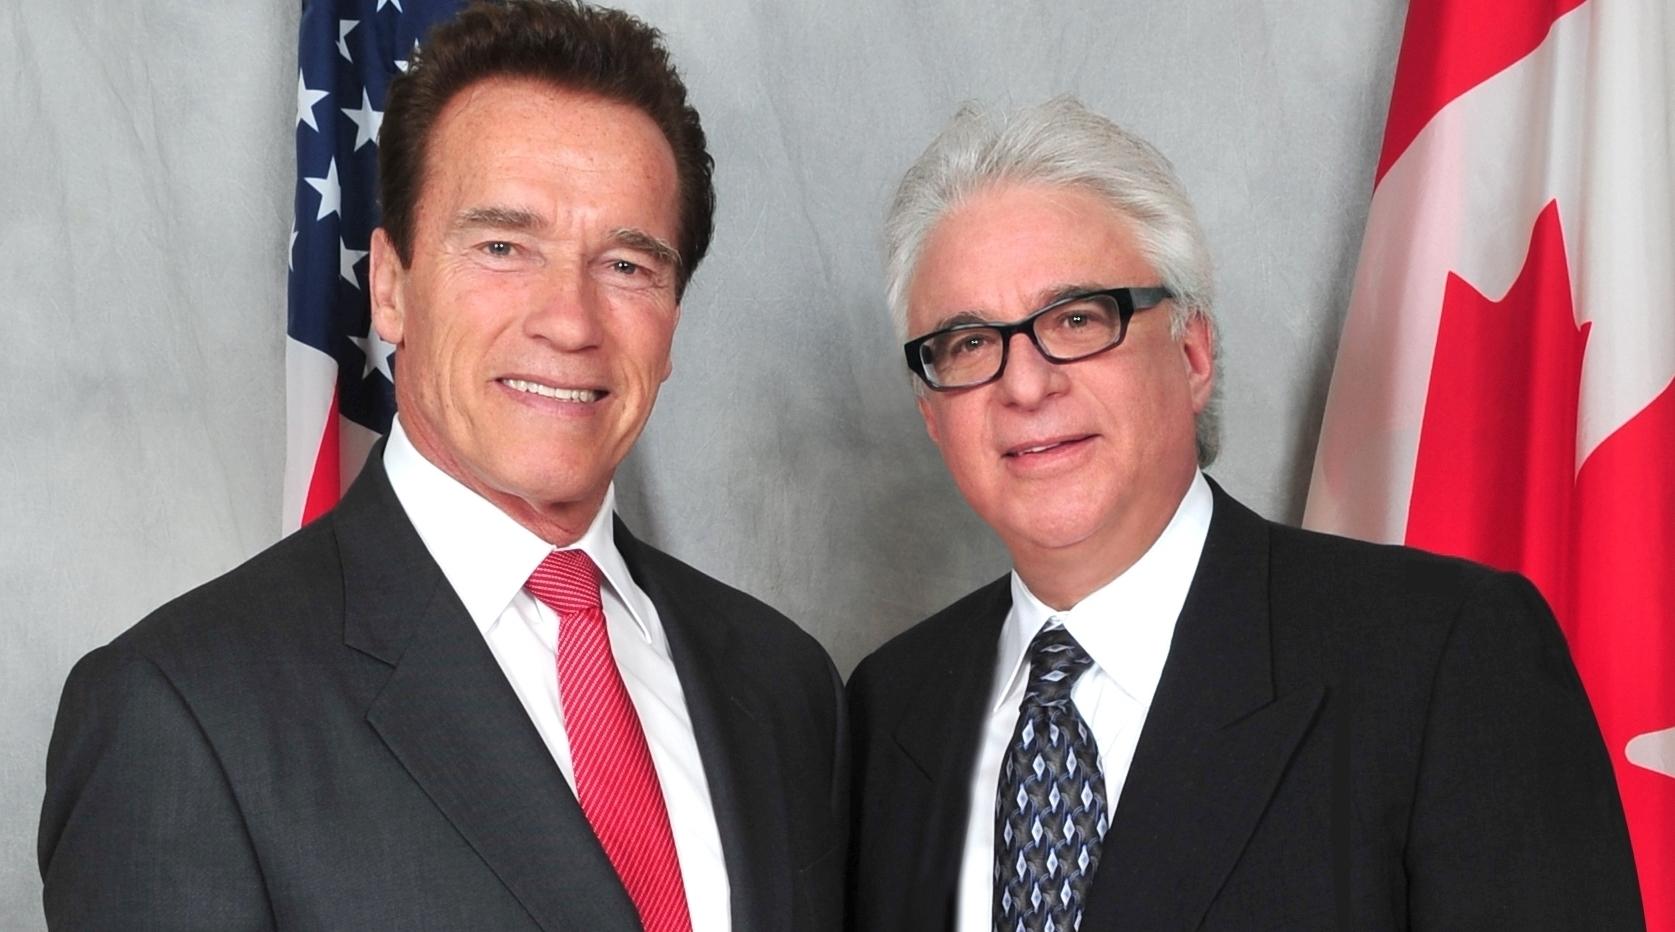 Jeff with Arnold Schwarzenegger